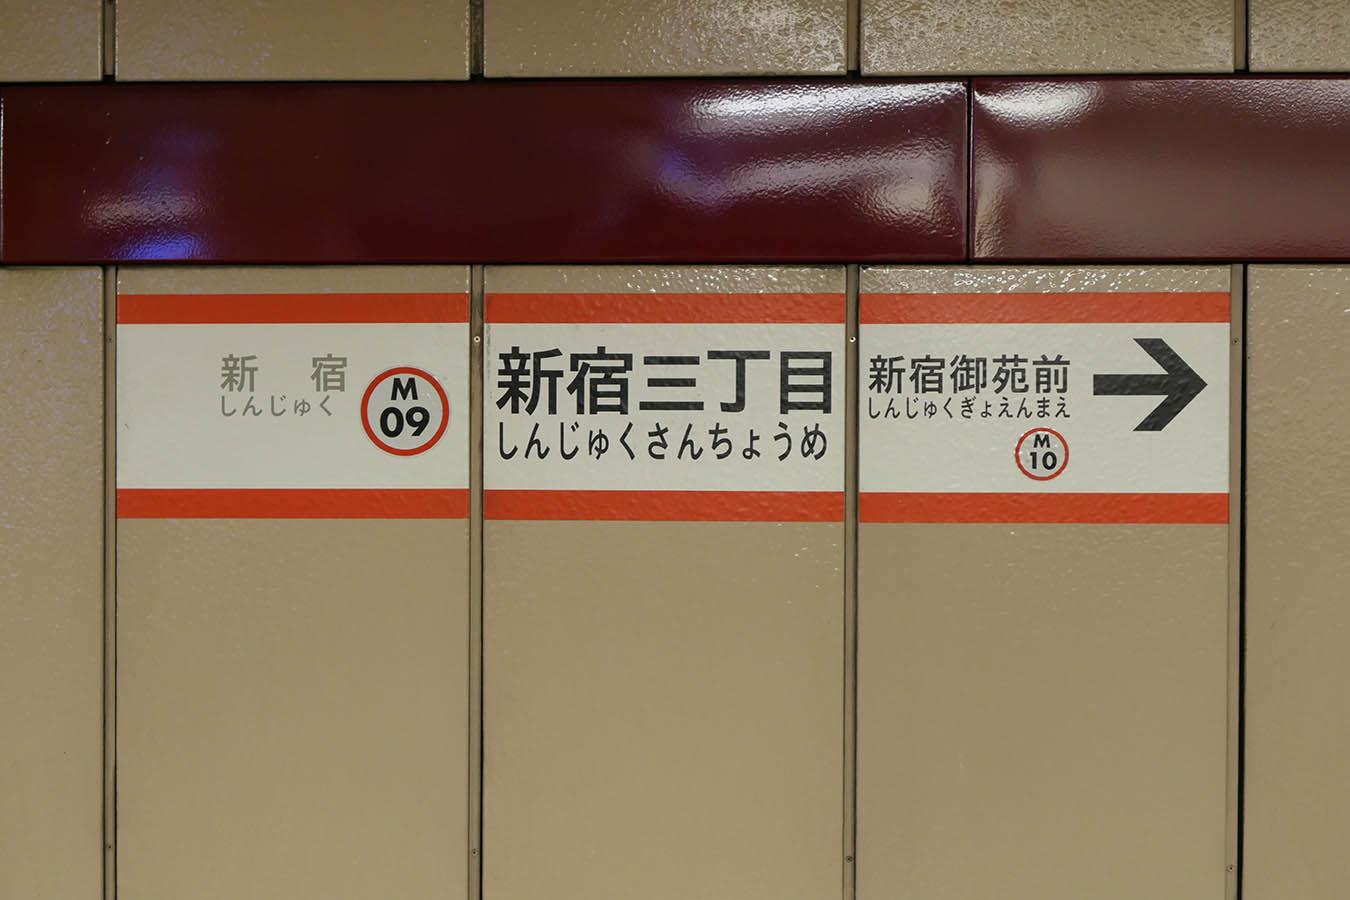 M08_photo04.jpg